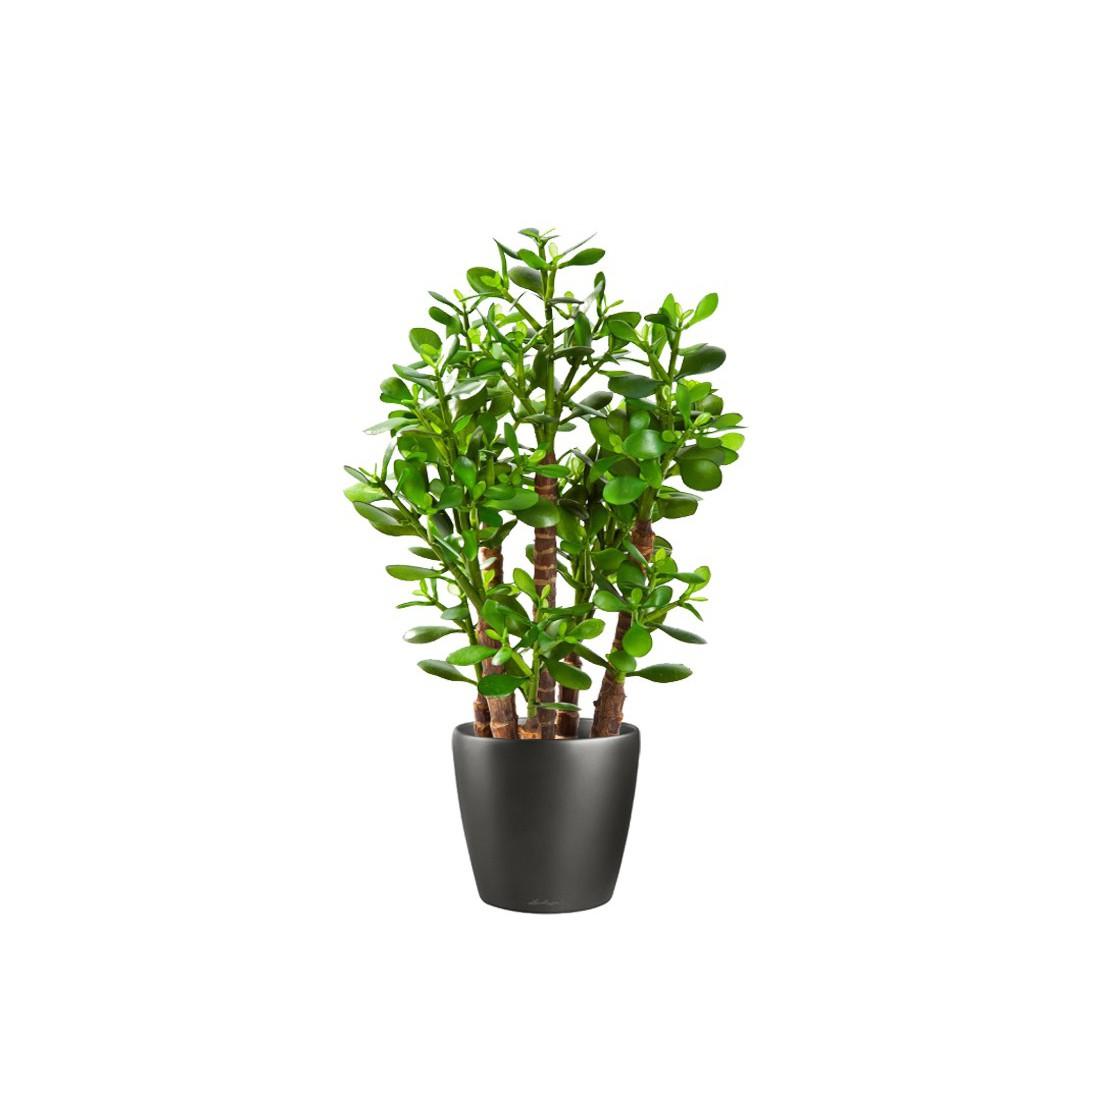 crassula artificiel ovata 60 cm cactus plantes grasses cactus et plantes grasses artificiels. Black Bedroom Furniture Sets. Home Design Ideas